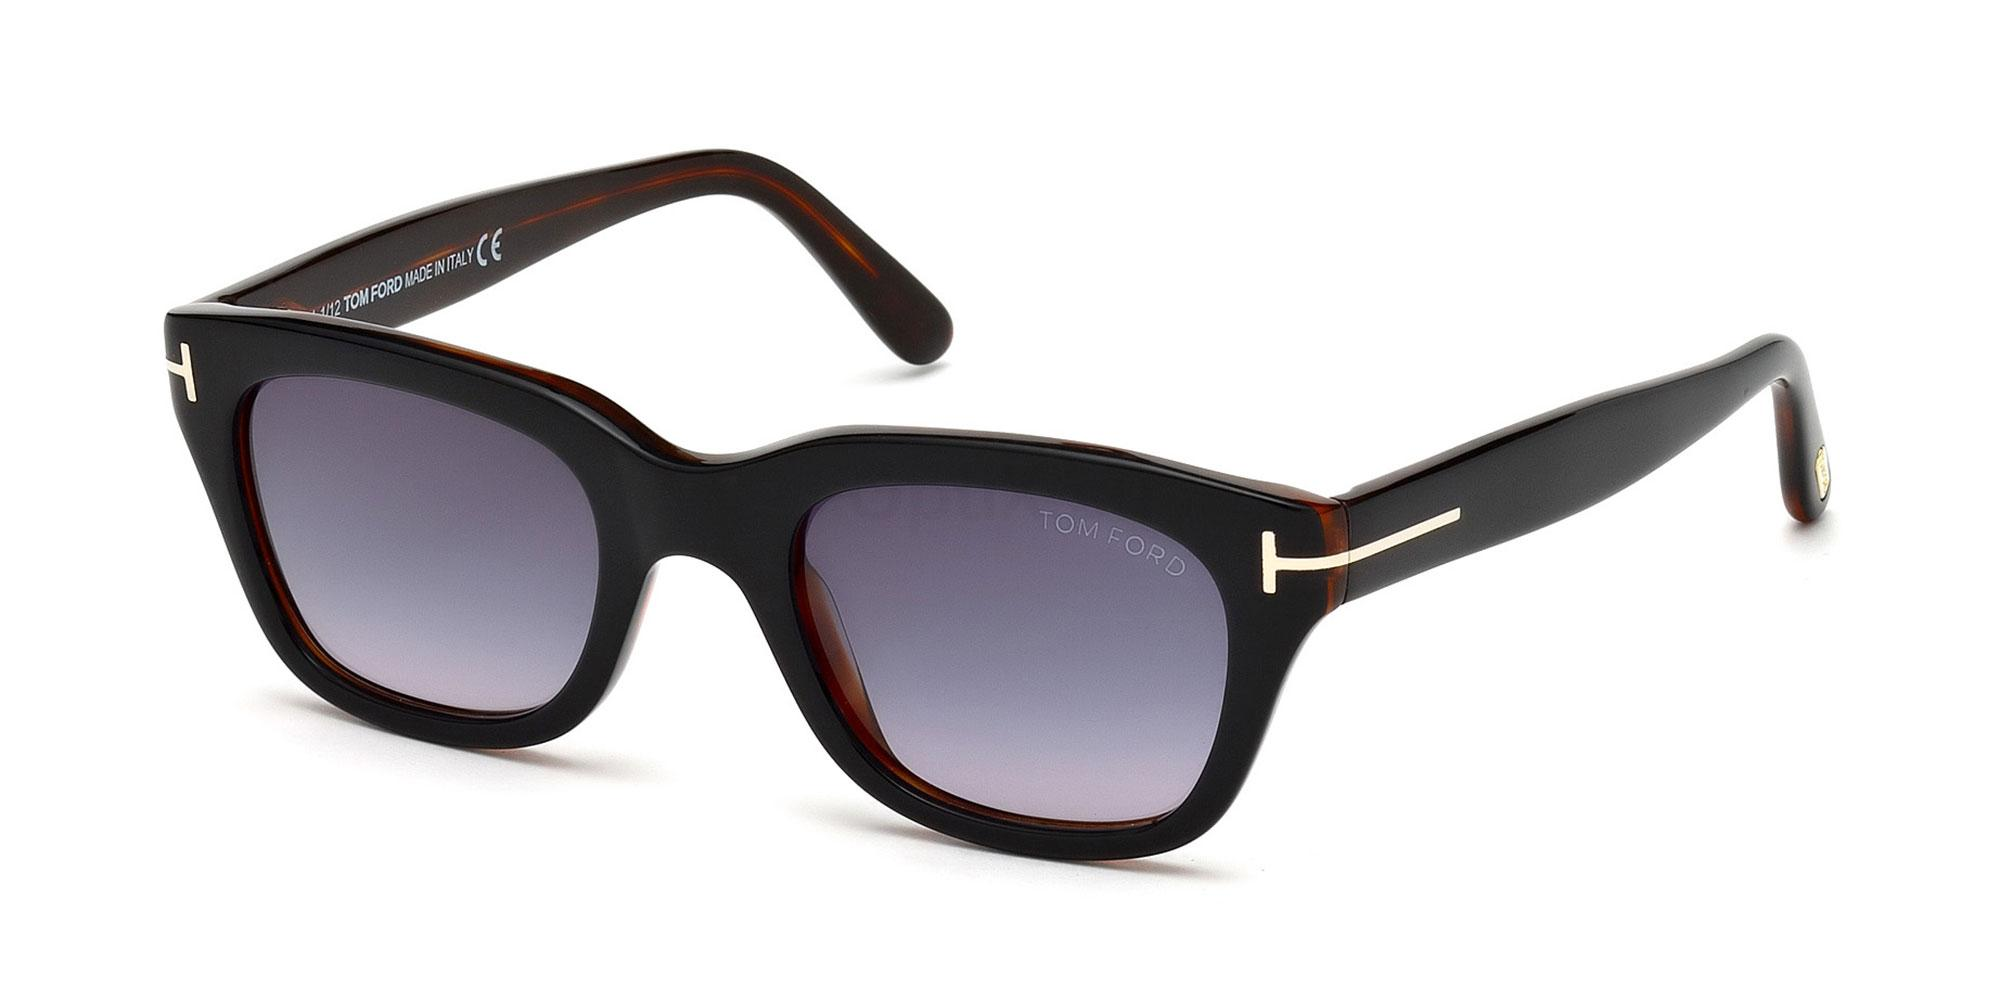 05B FT0237 Snowdon Sunglasses, Tom Ford